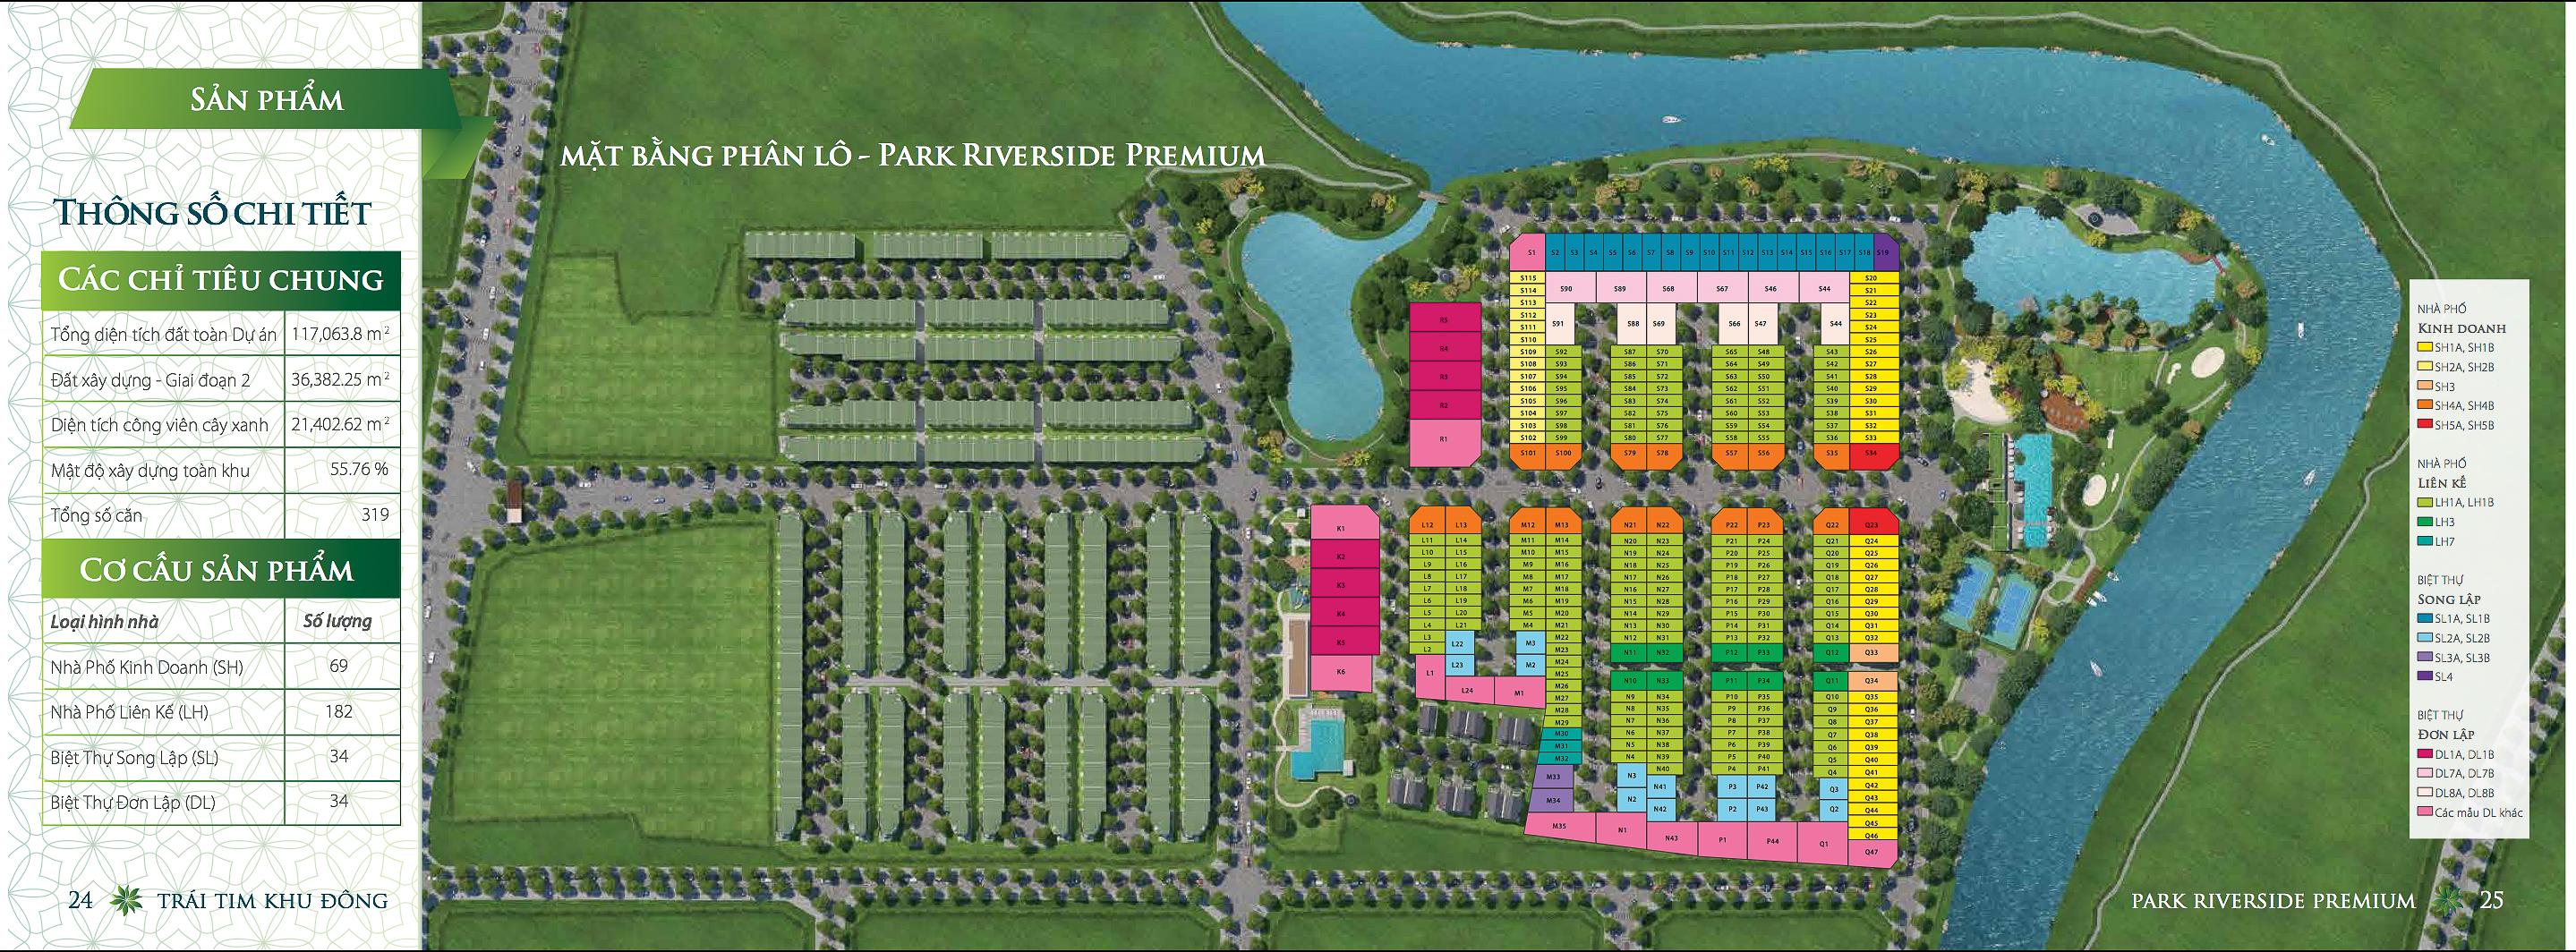 Park Riverside Premium mặt bằng tổng thể